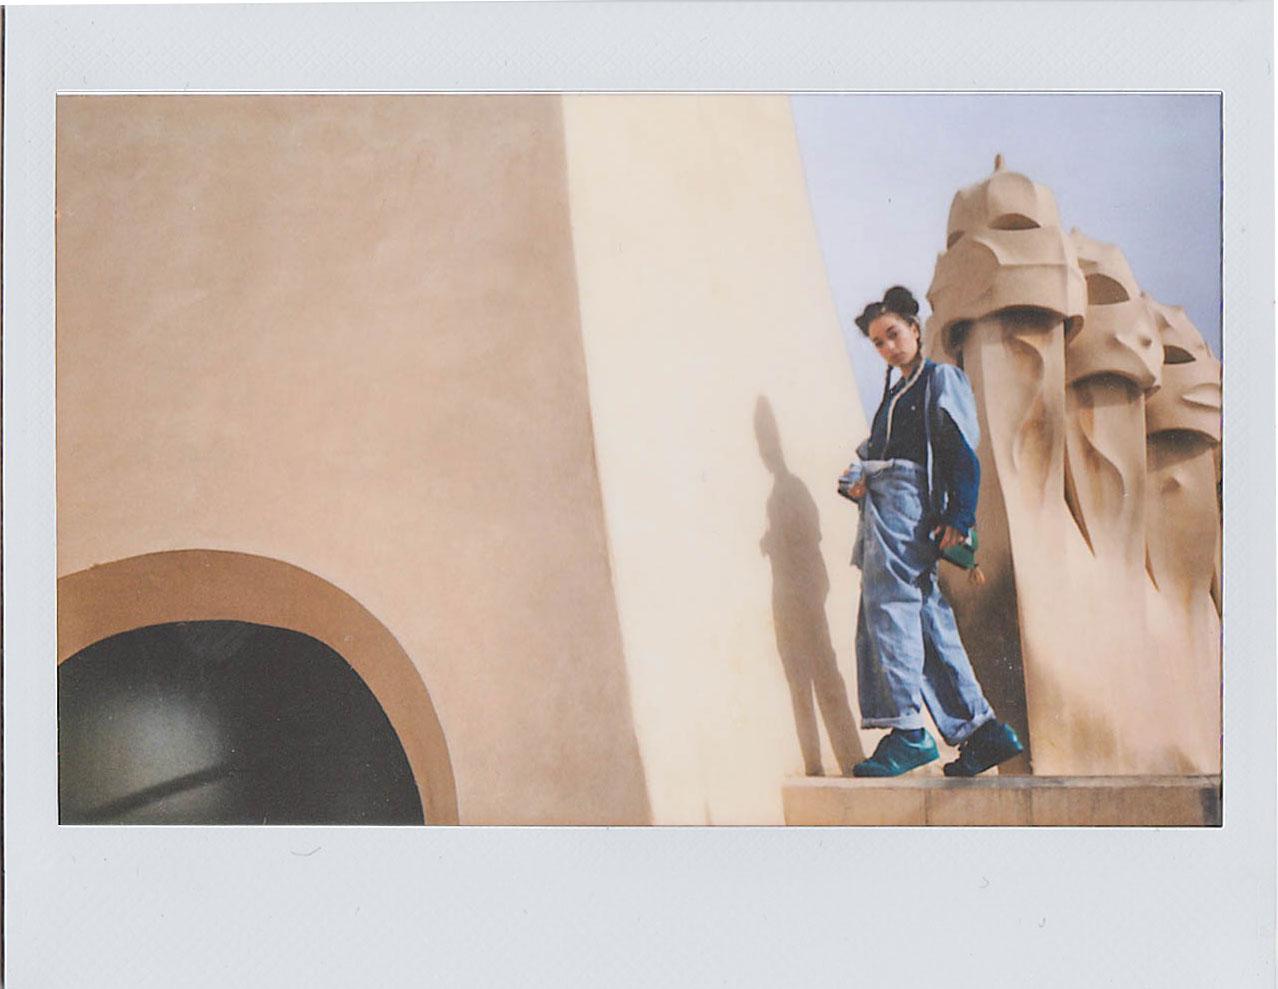 BLONDE-Barcelona-Editorial-Polaroid-1